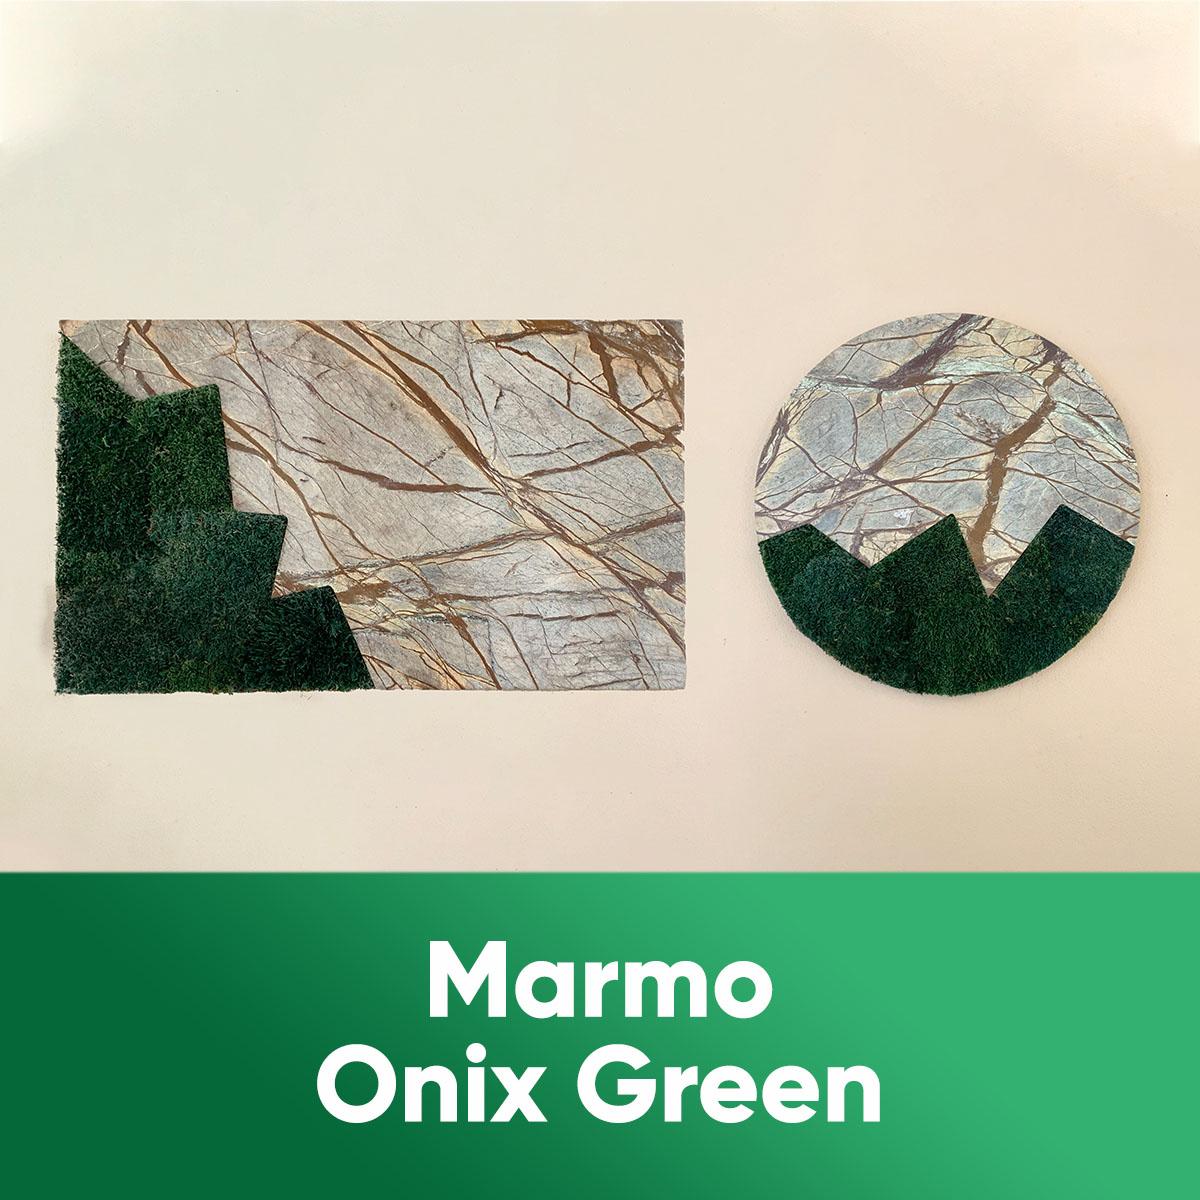 MARMO ONIX GREEN